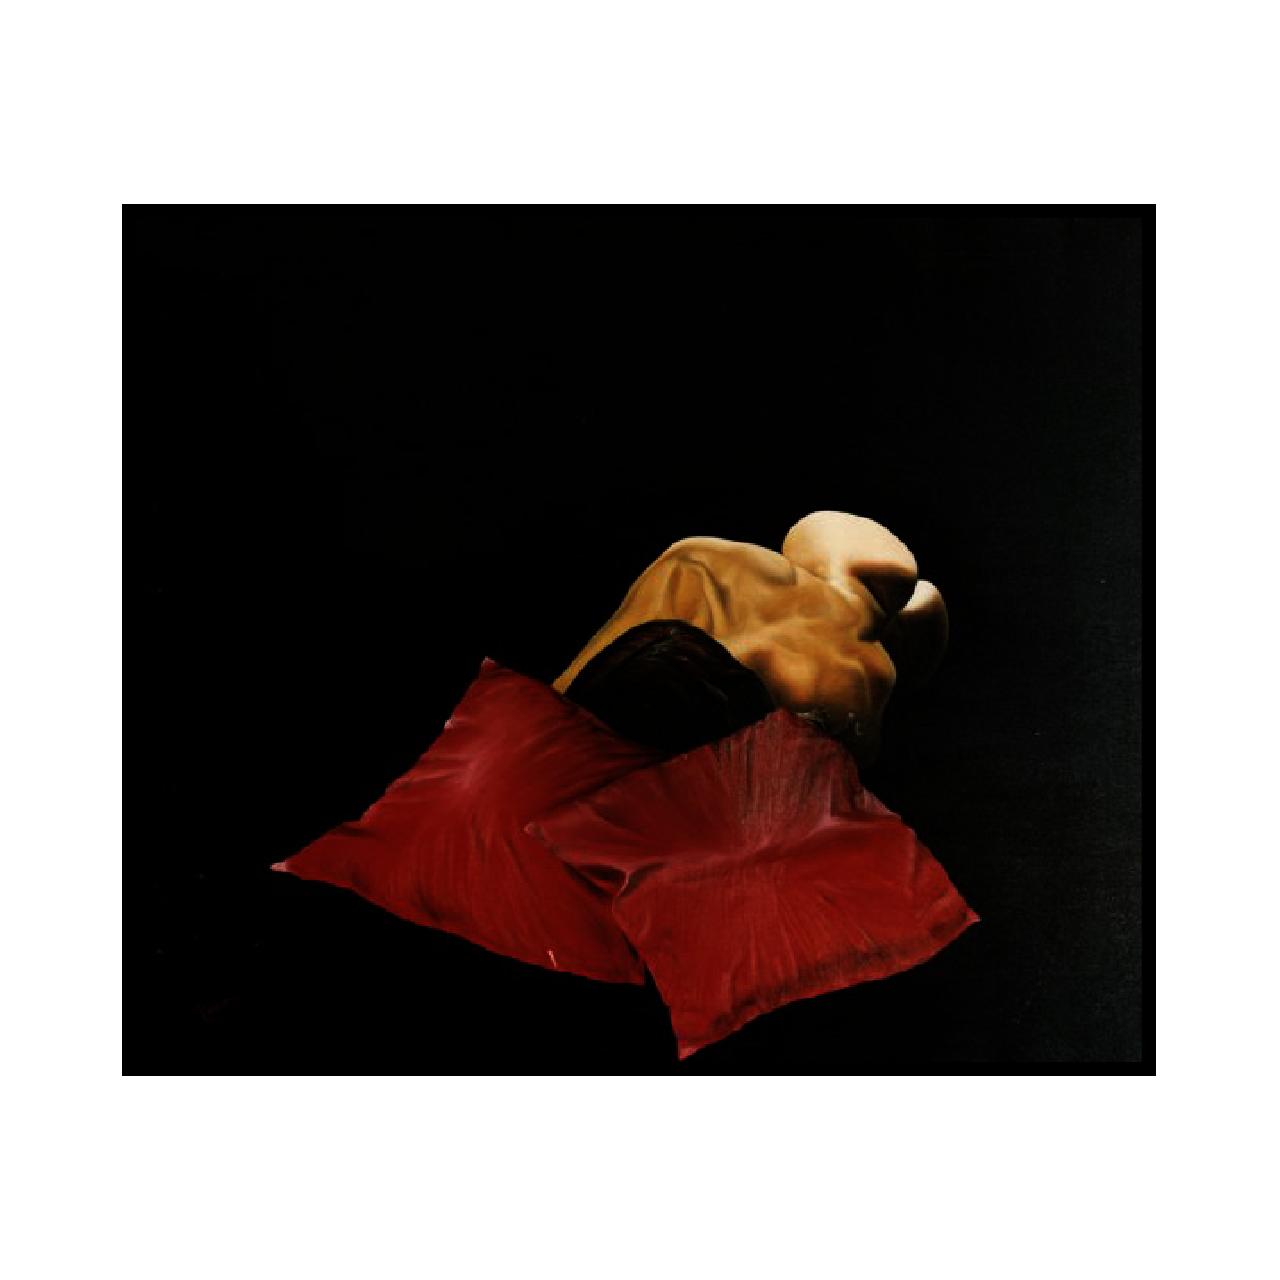 quadro dipinto olio Mario Pavesi pittura artista reggiano tecnica velature